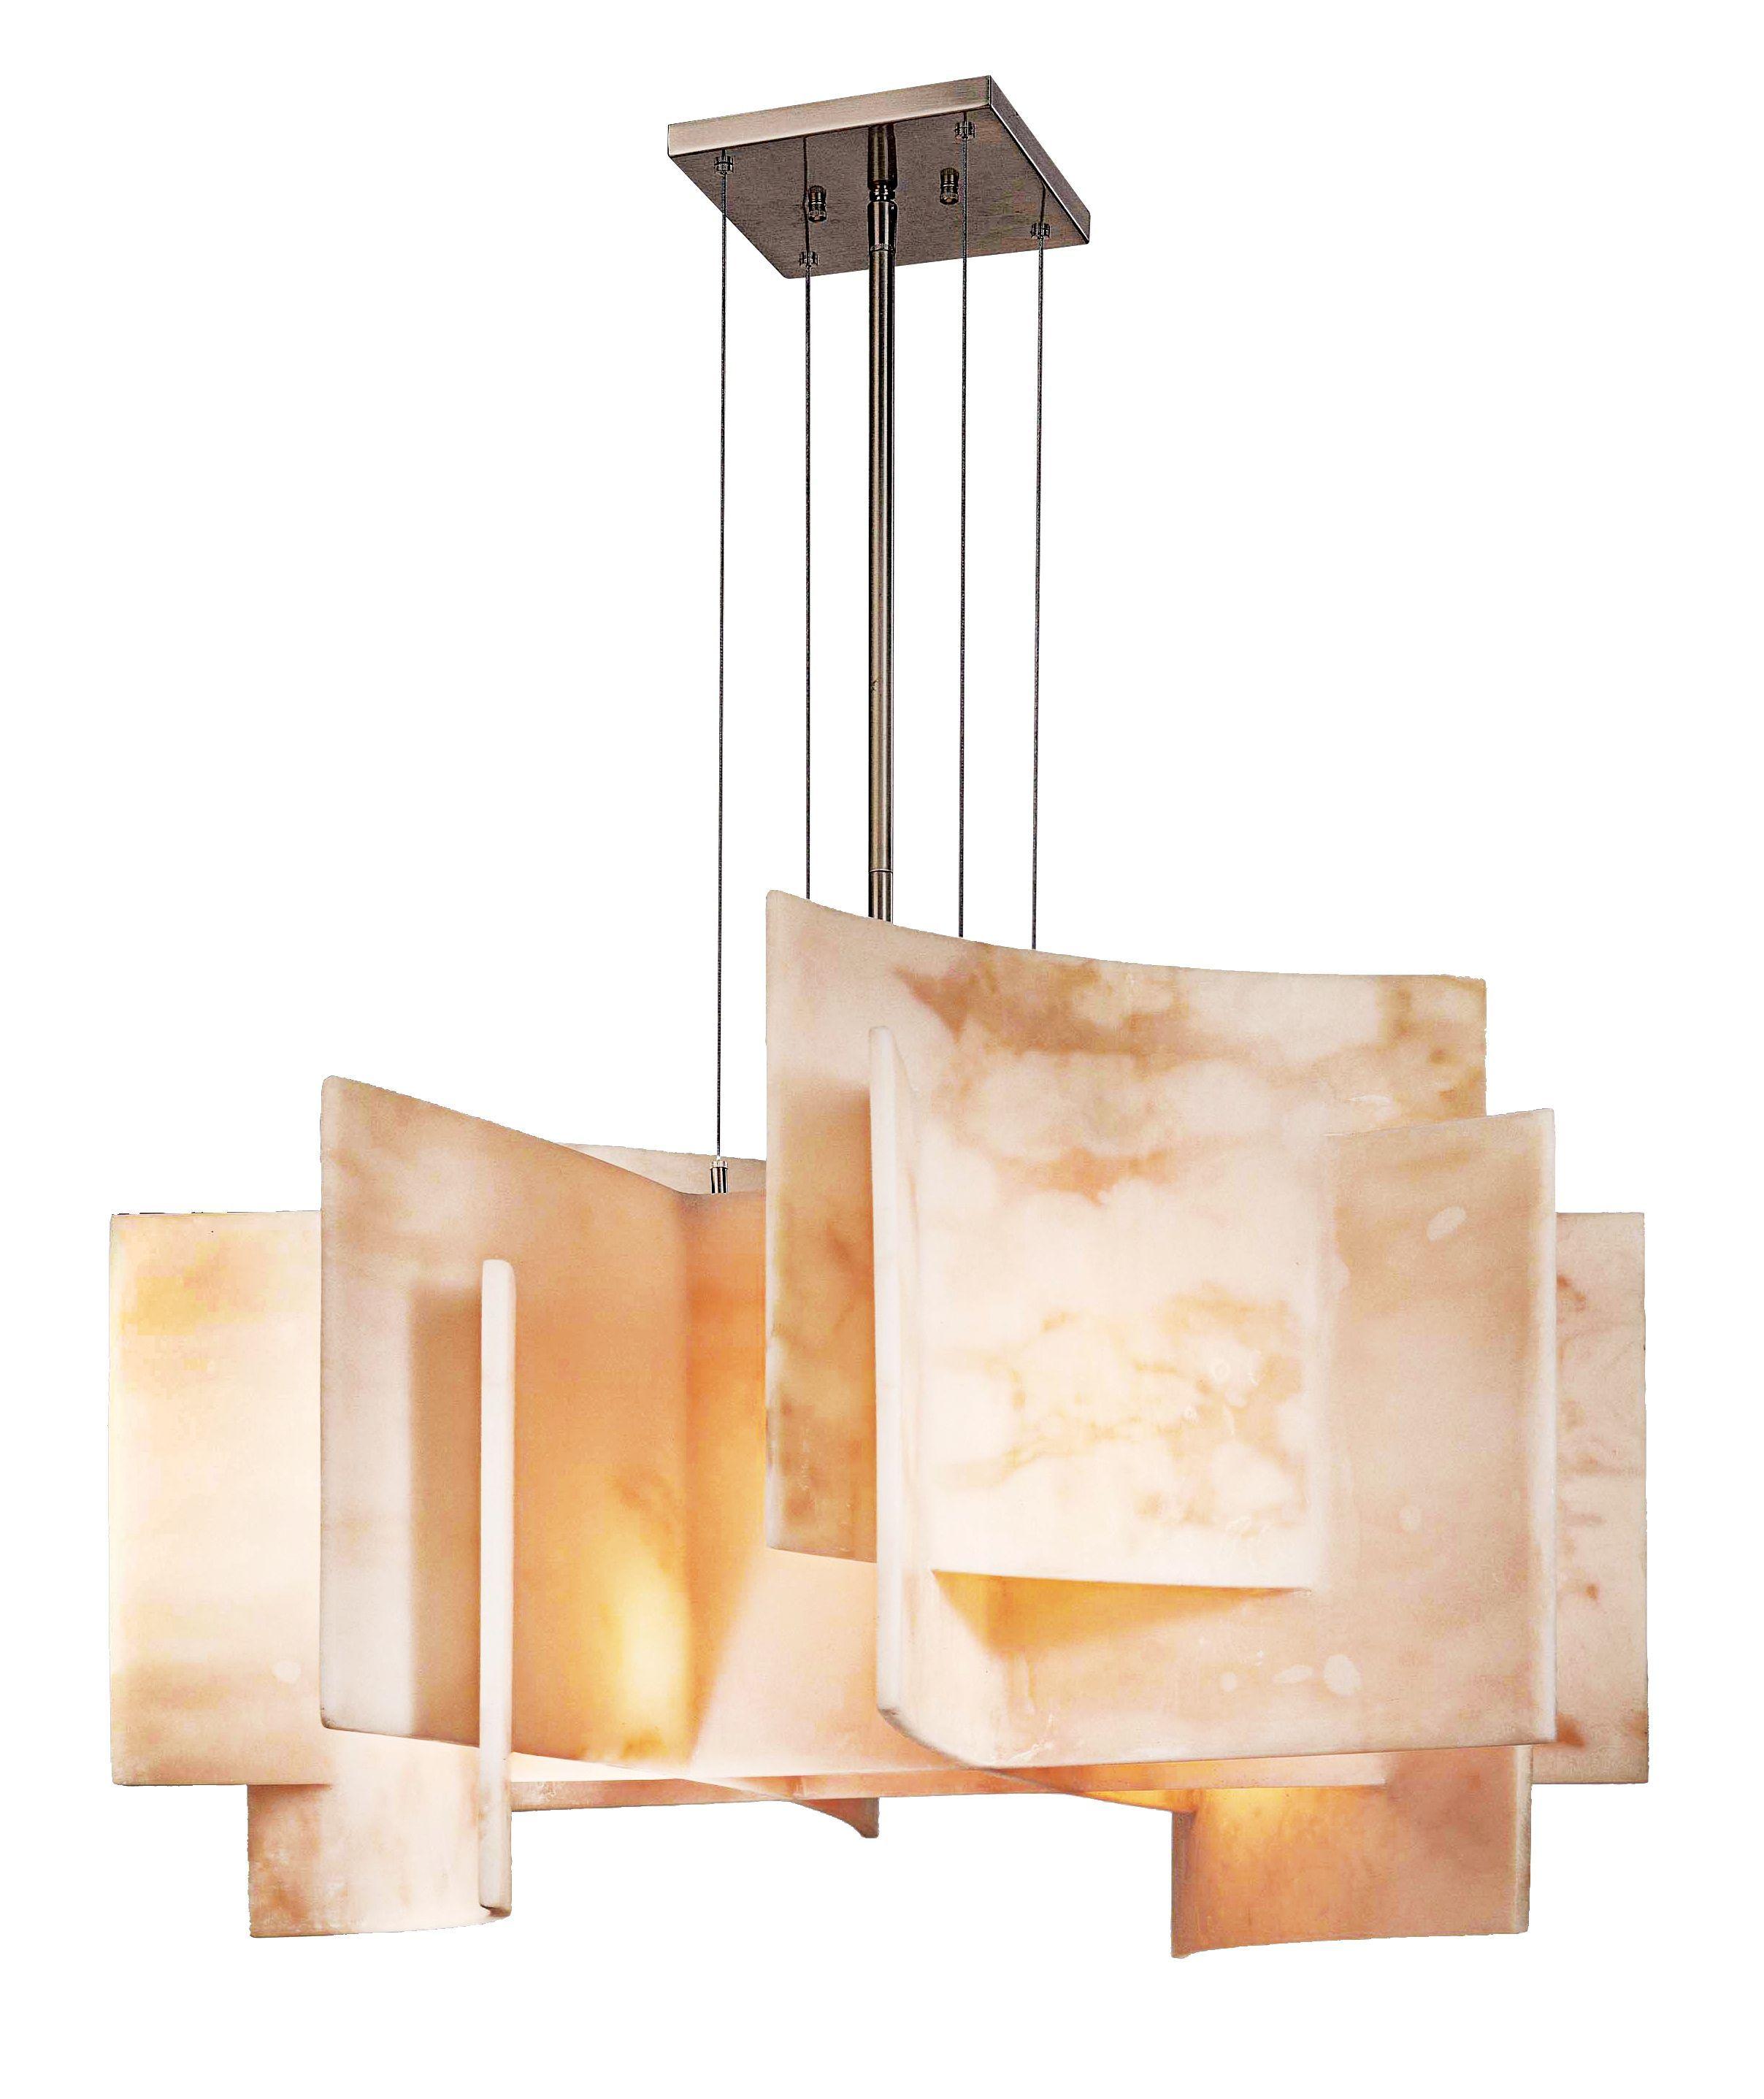 Alabaster Dust Glass 30 Inch W George Kovacs Chandelier Eurostylelighting Com